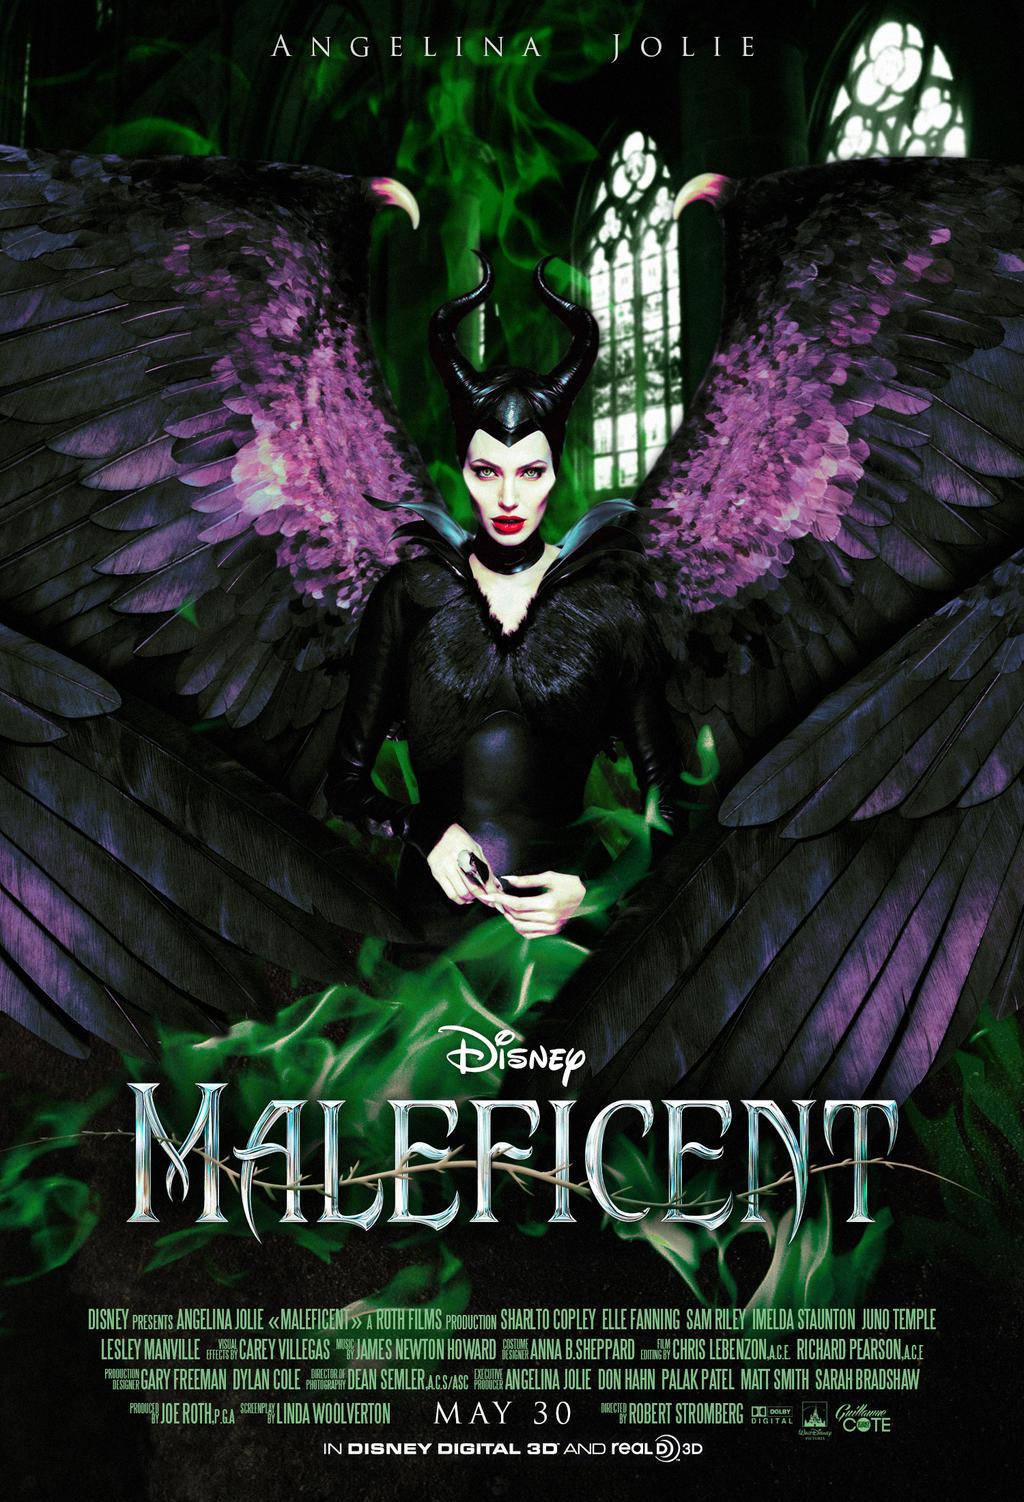 maleficent poster final by graphuss on deviantart